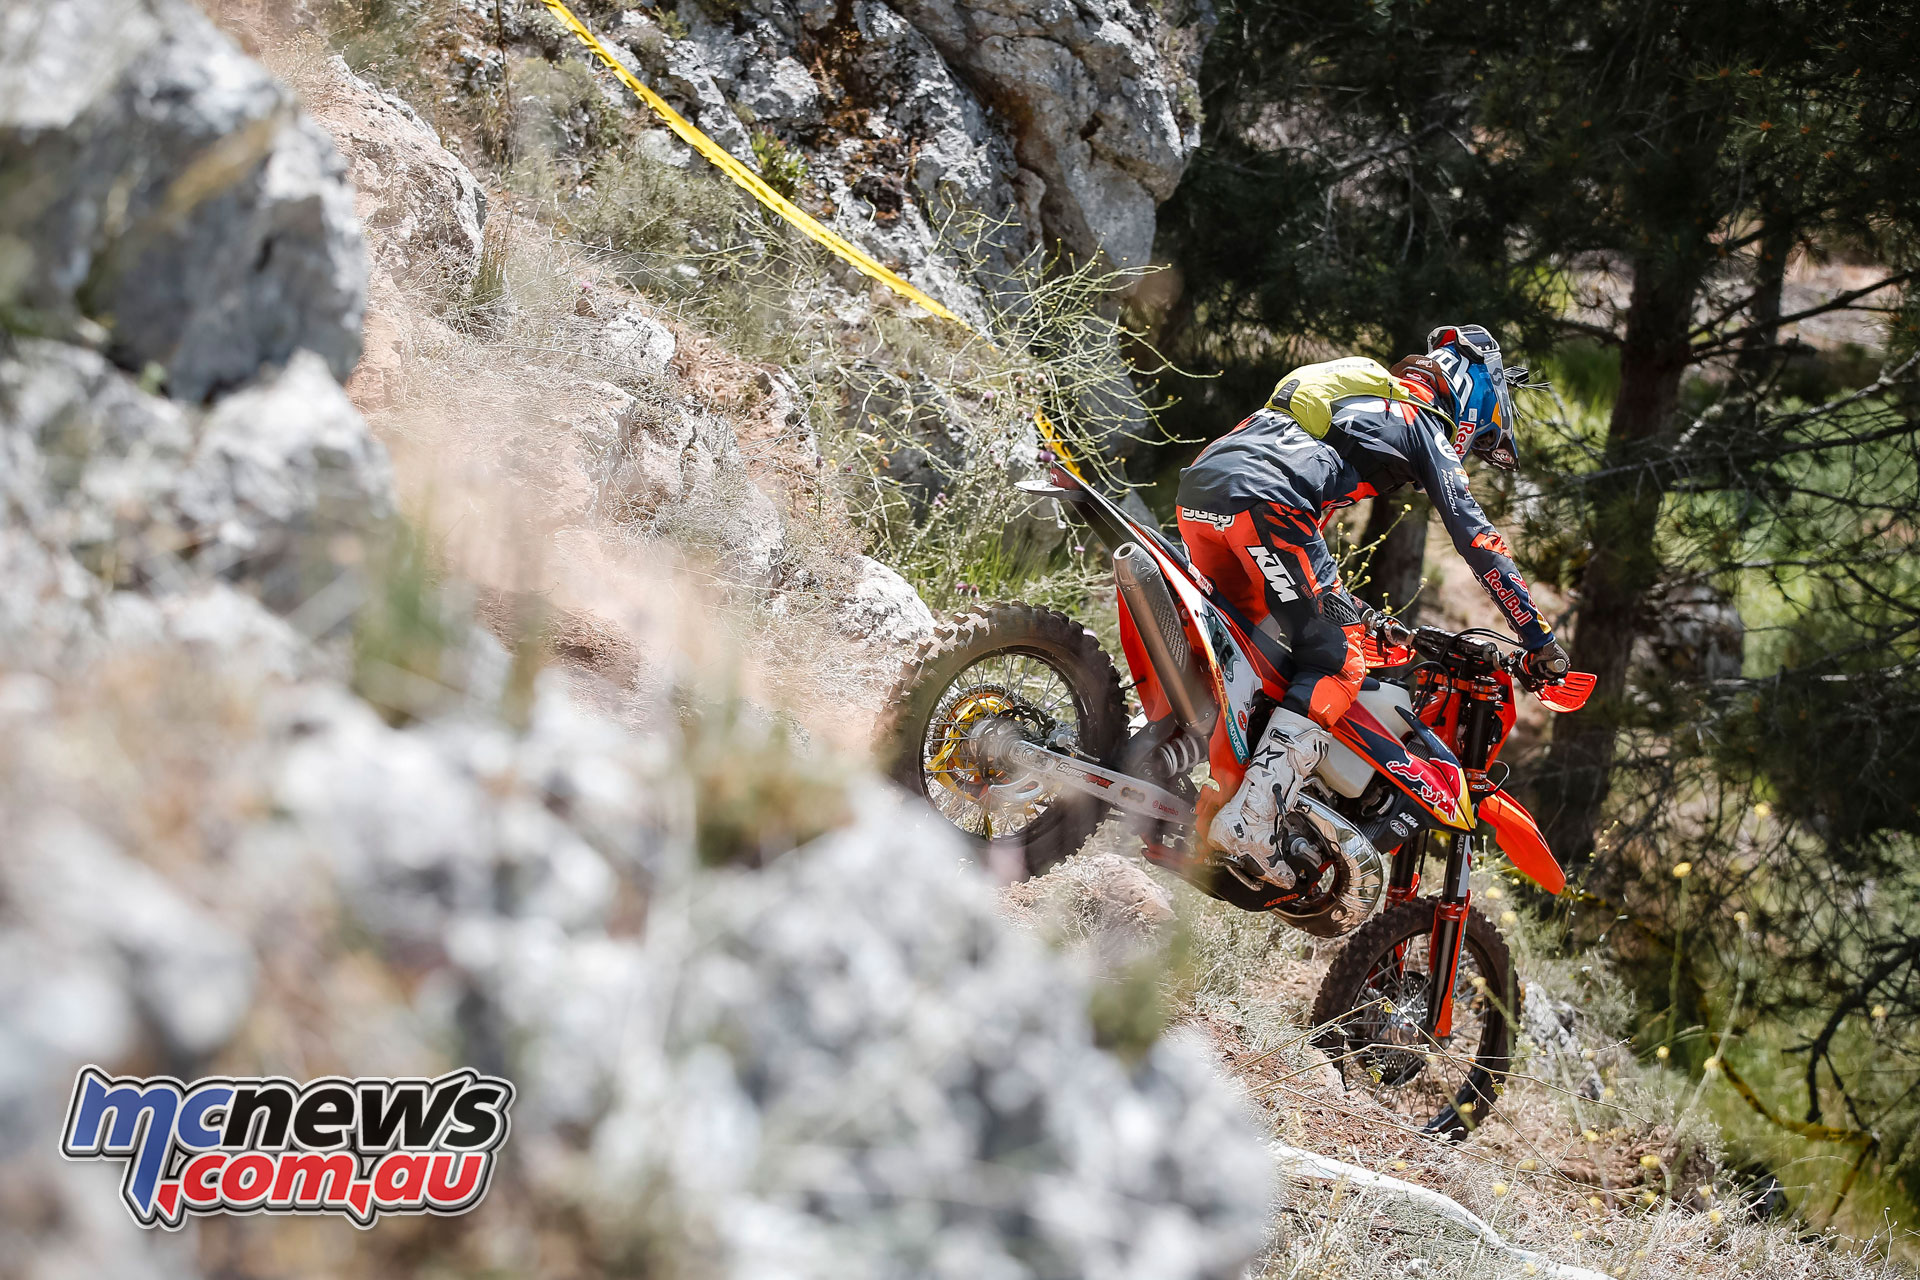 WESS Hixpania Hard Enduro Josep Garcia